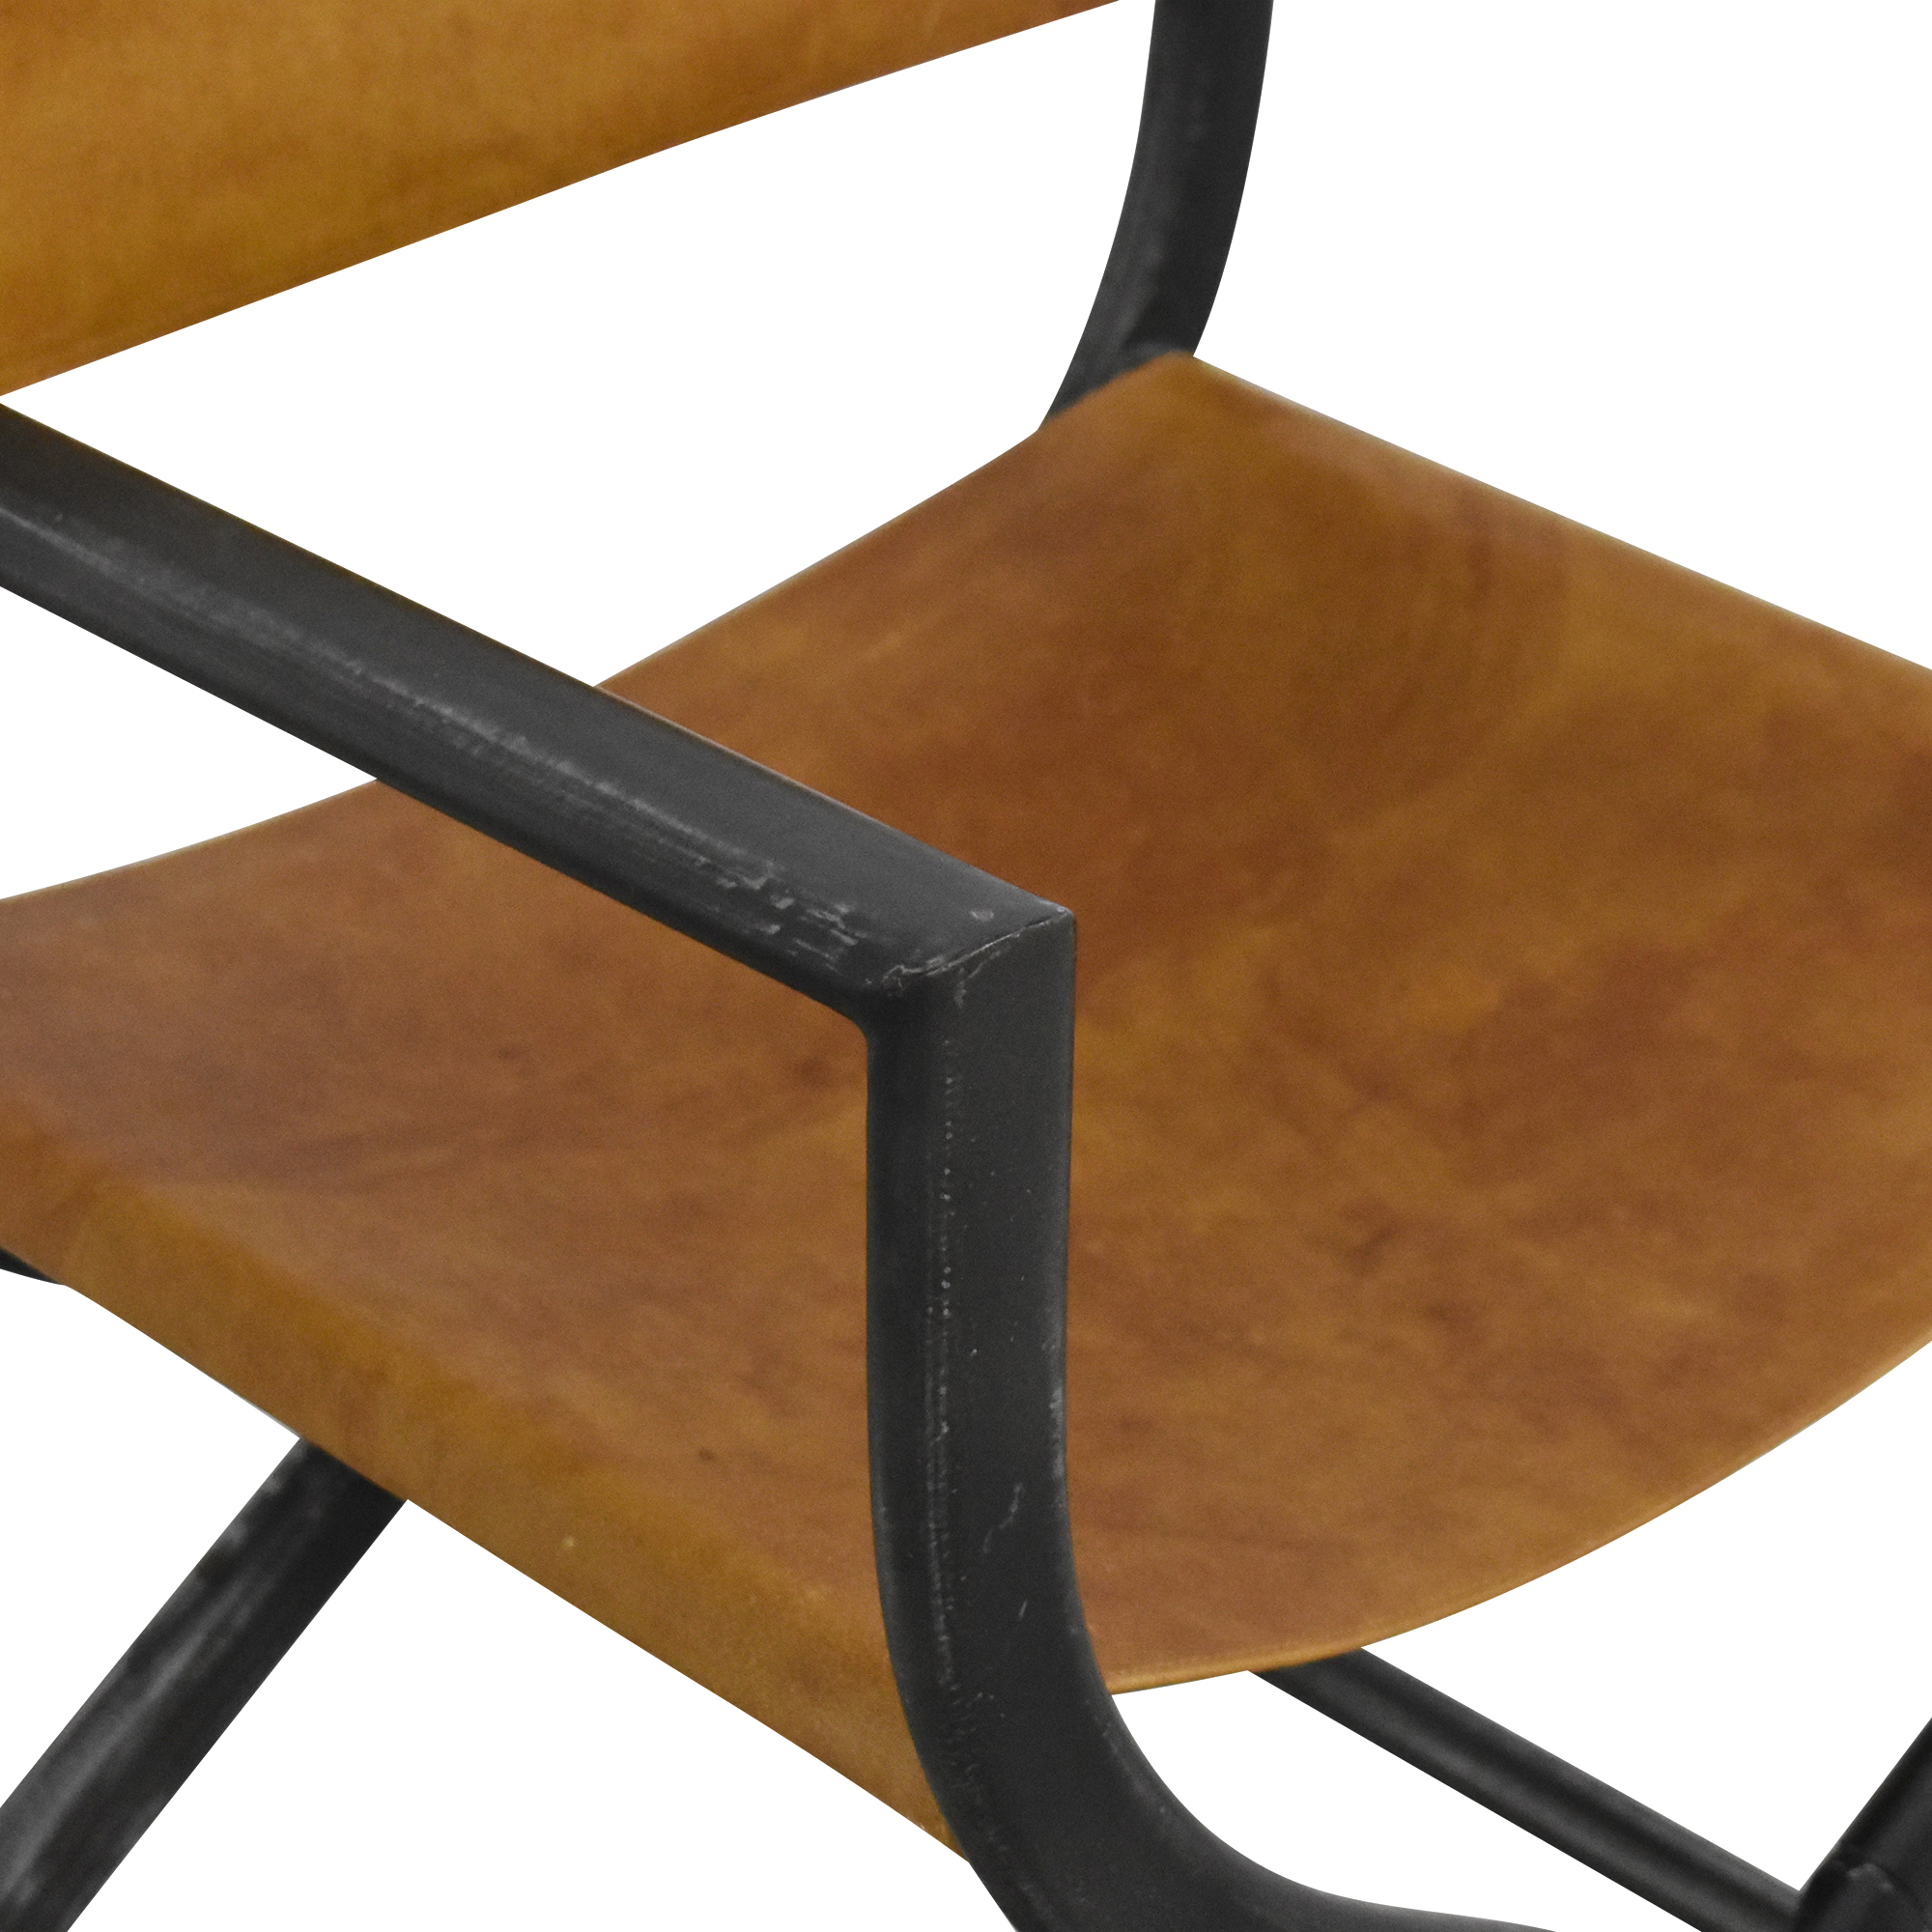 buy Restoration Hardware 1970s French Director's Chair Restoration Hardware Chairs